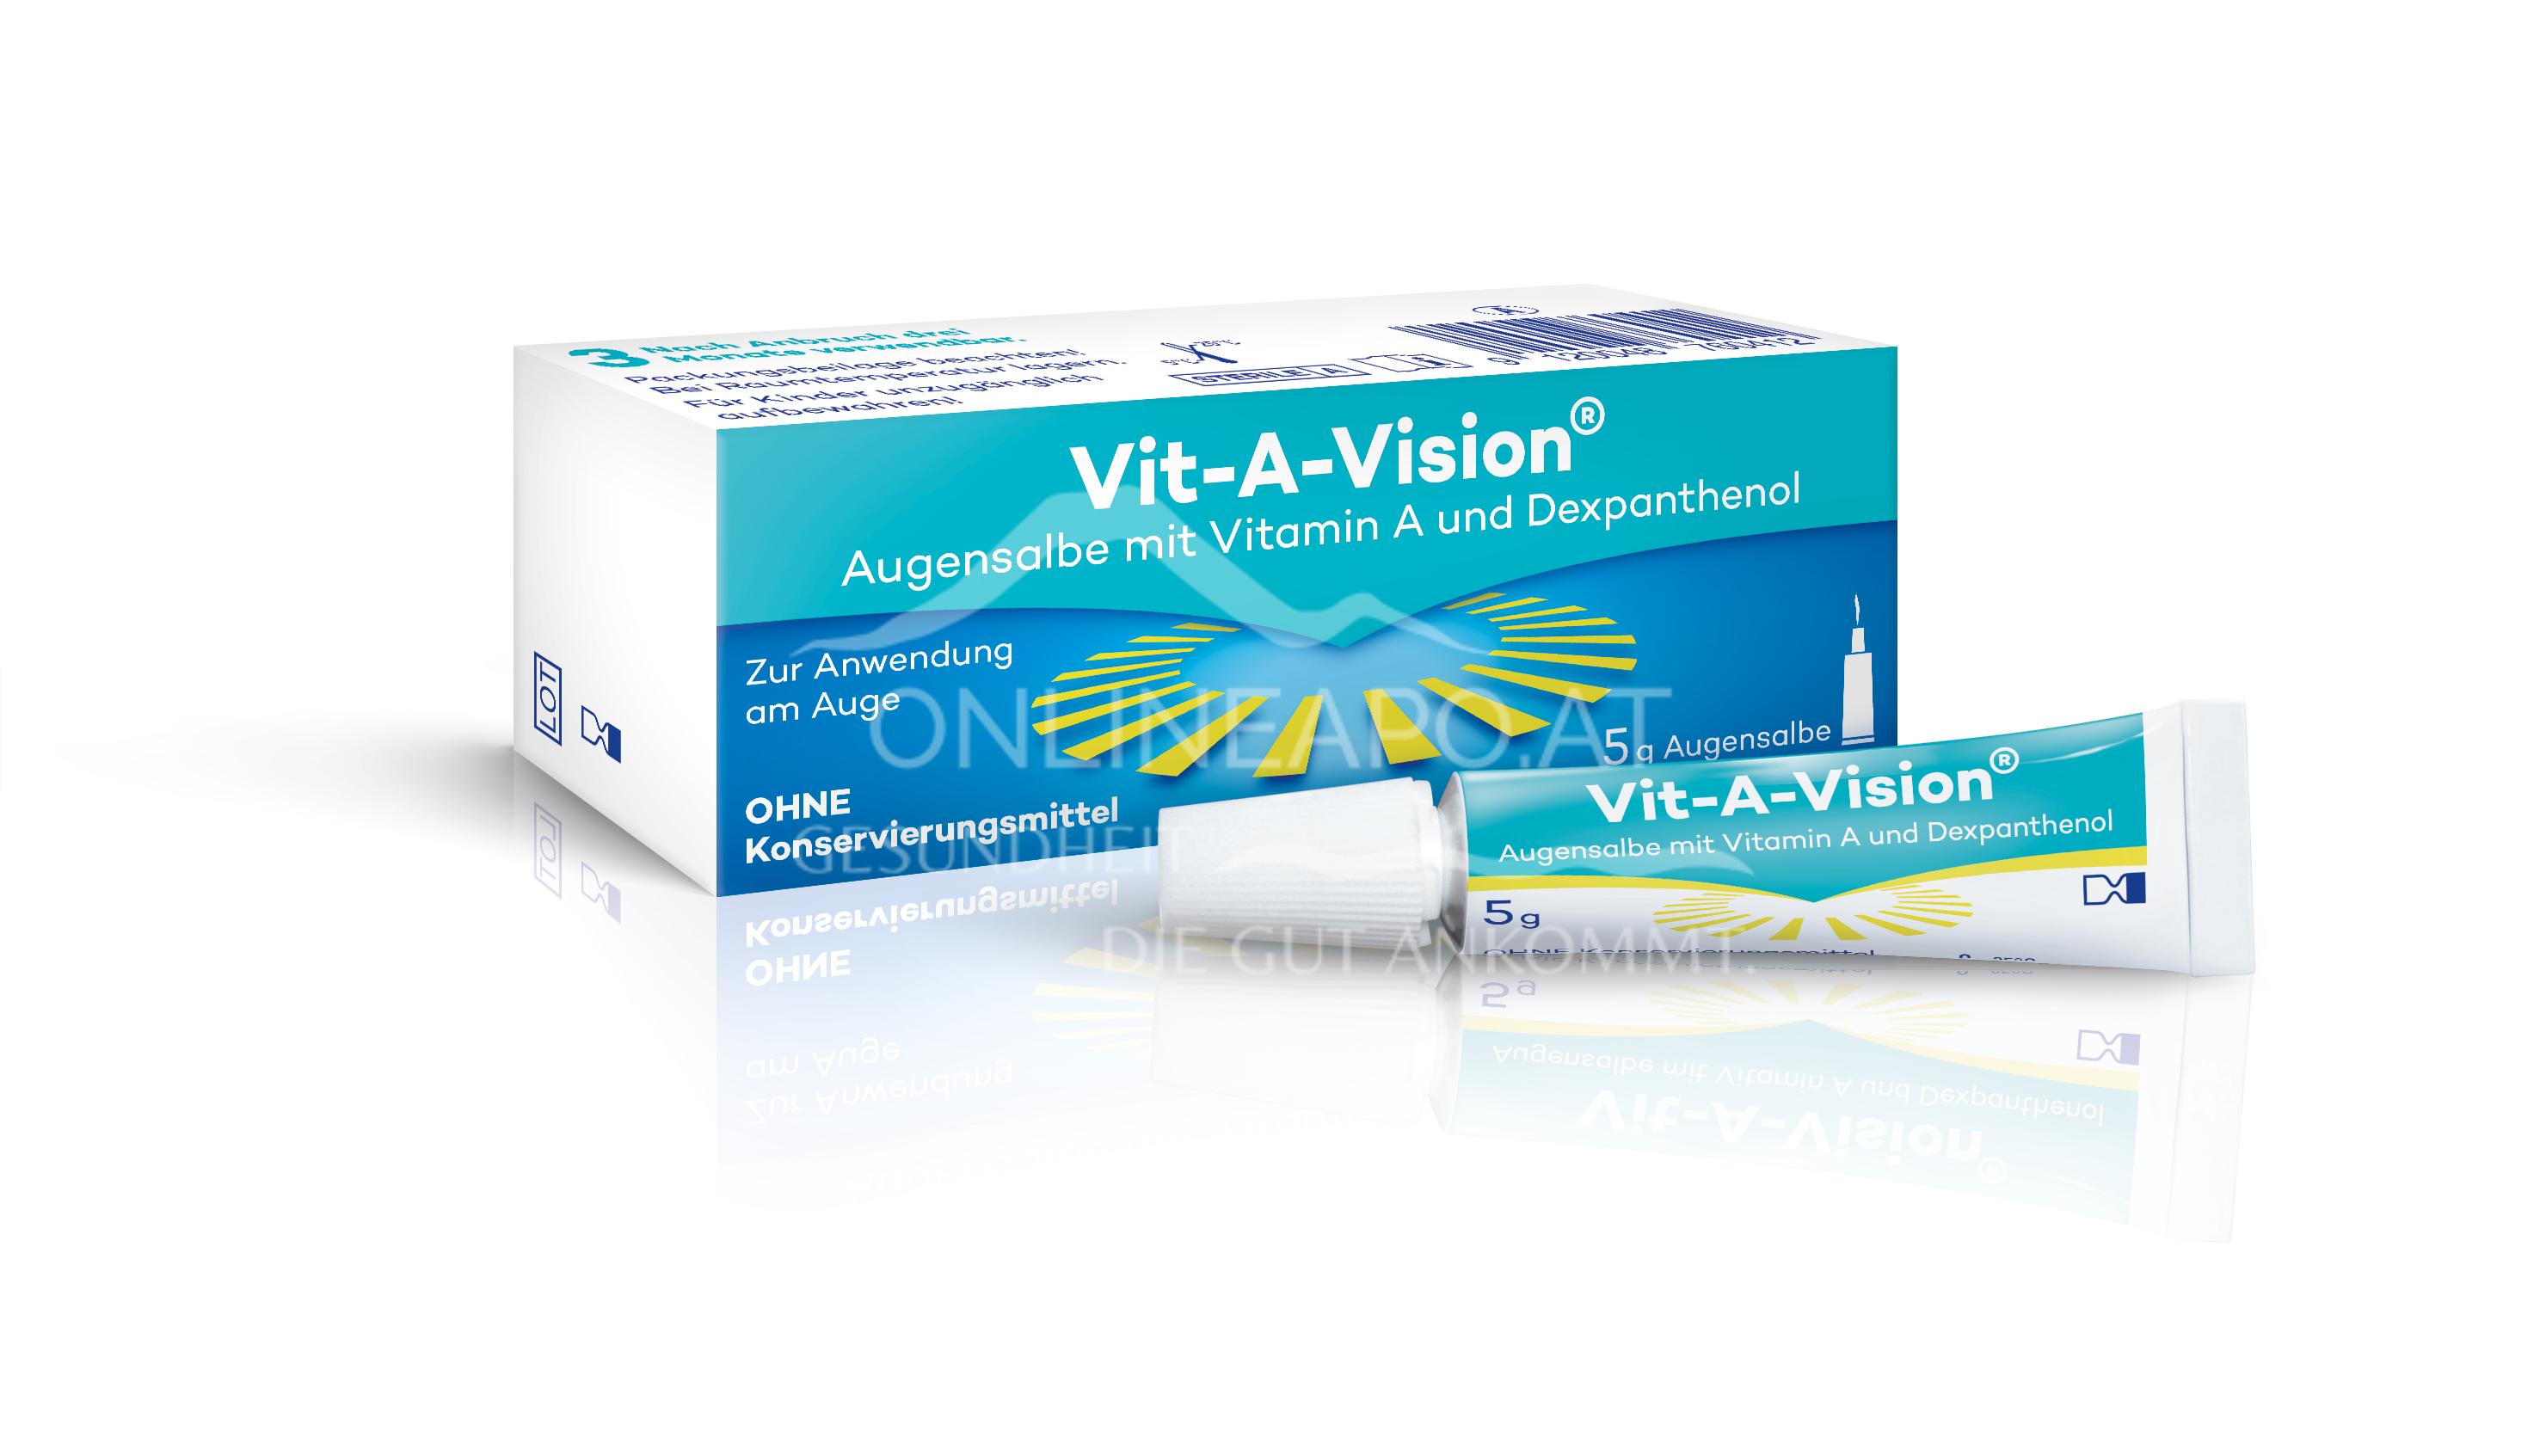 Vit-A-Vision® Augensalbe